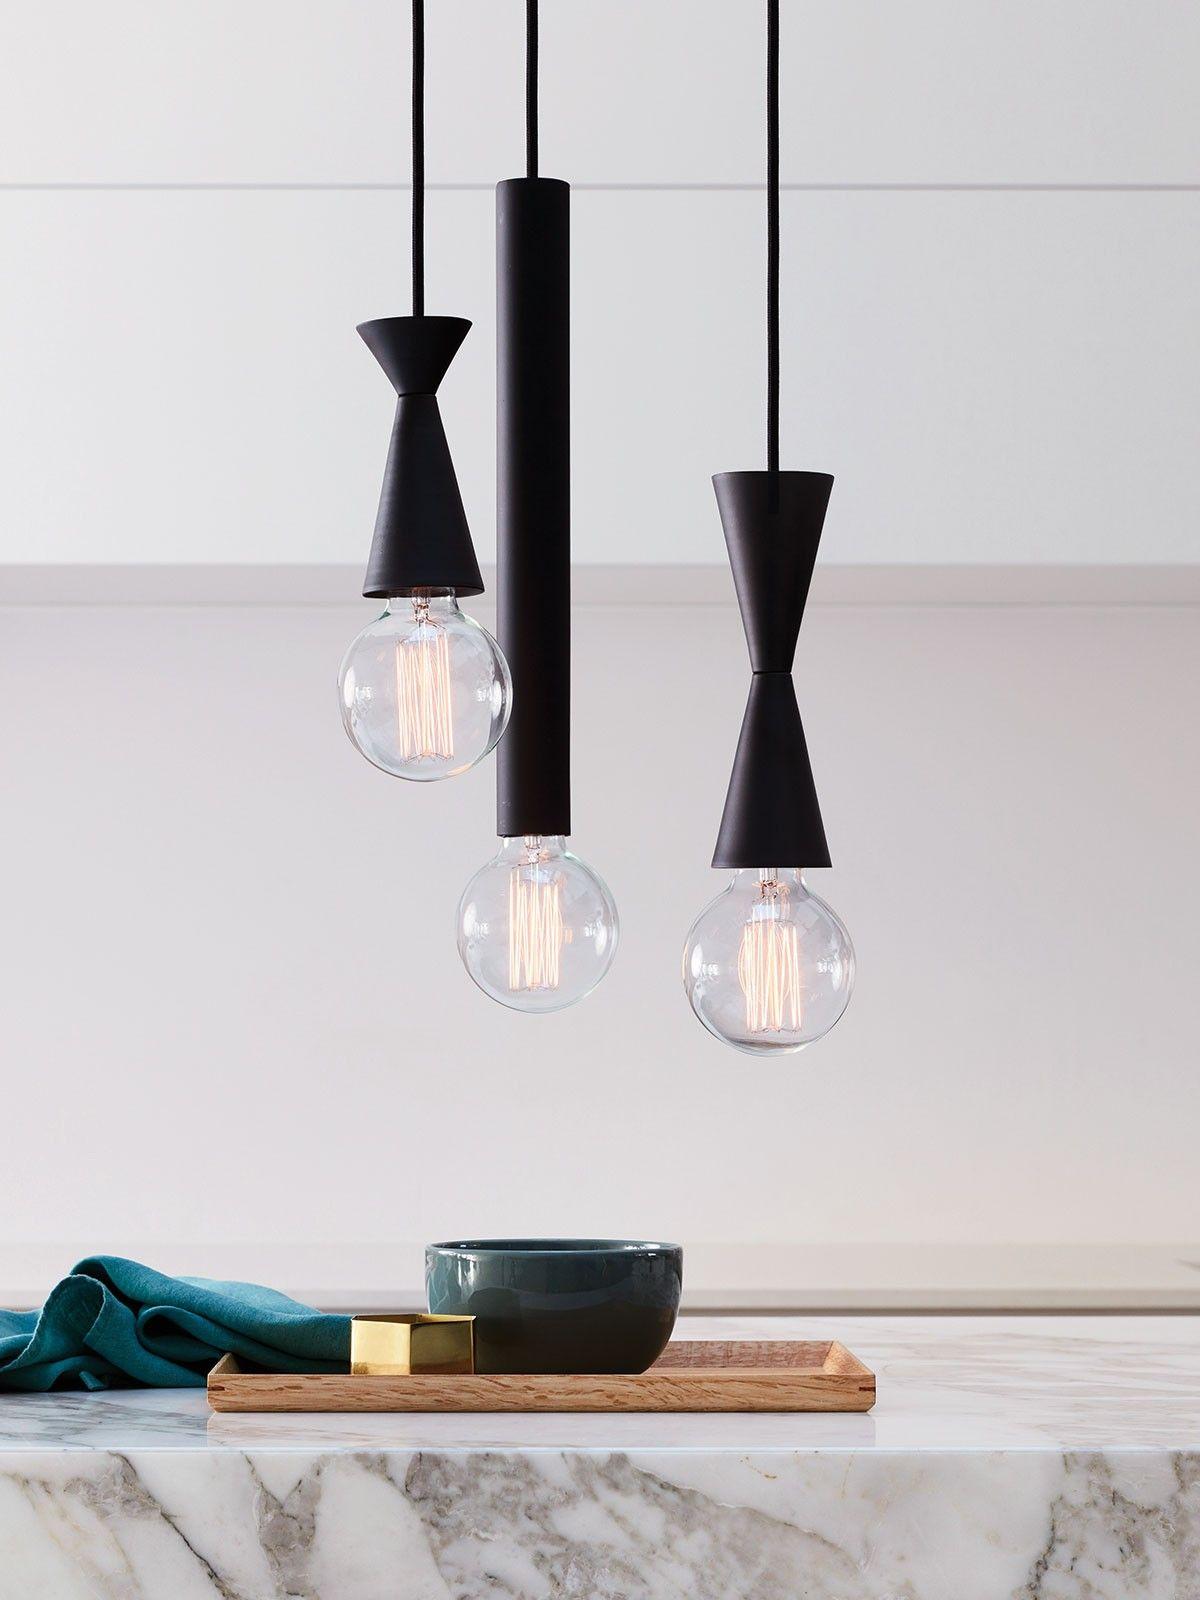 Zinc 1 Light Medium Pendant In Black Decorative Pendant Lighting Bathroom Pendant Lighting Plug In Pendant Light